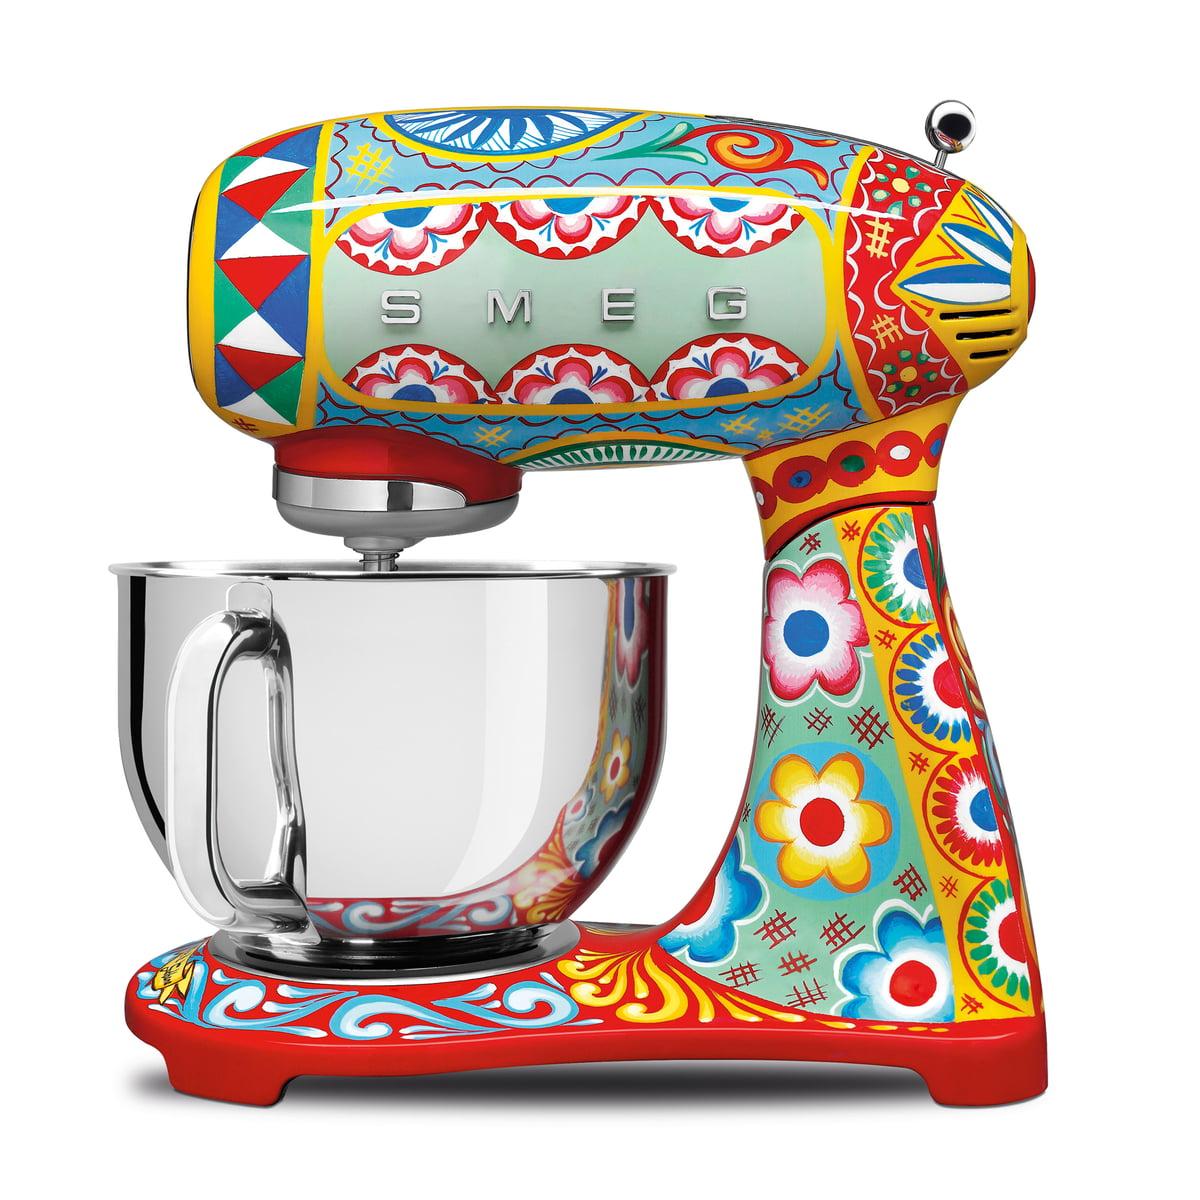 SMEG - Küchenmaschine SMF03, Dolce & Gabbana